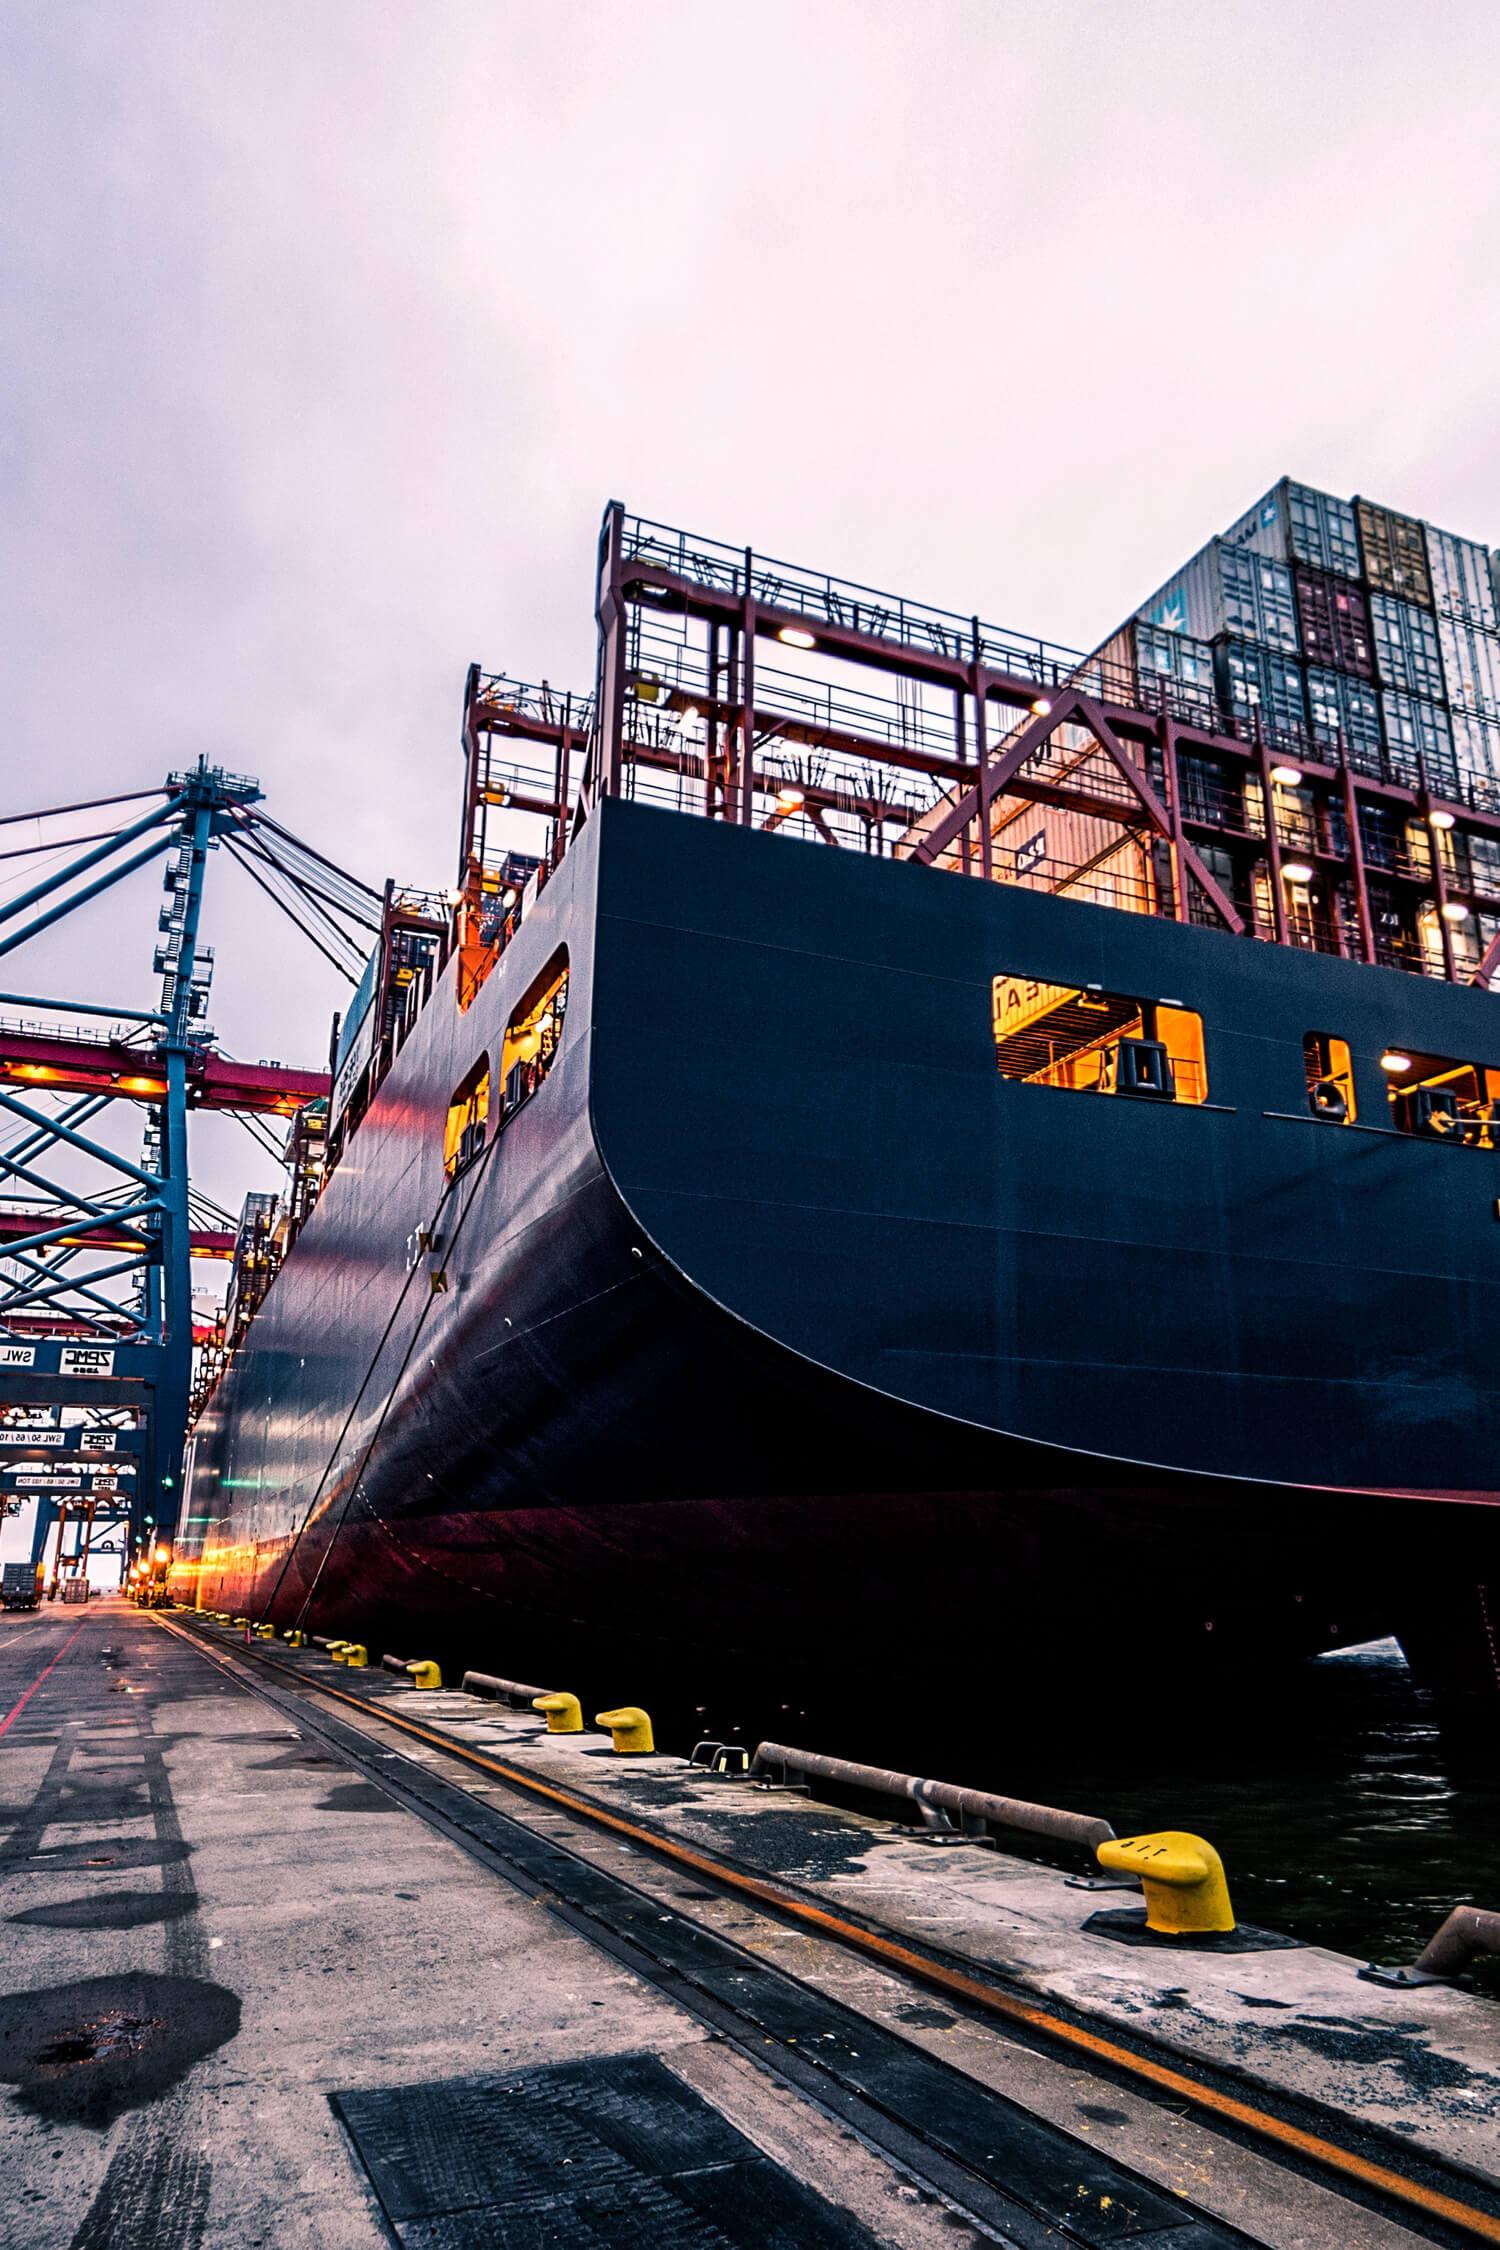 Marine, Shipping, and Boating